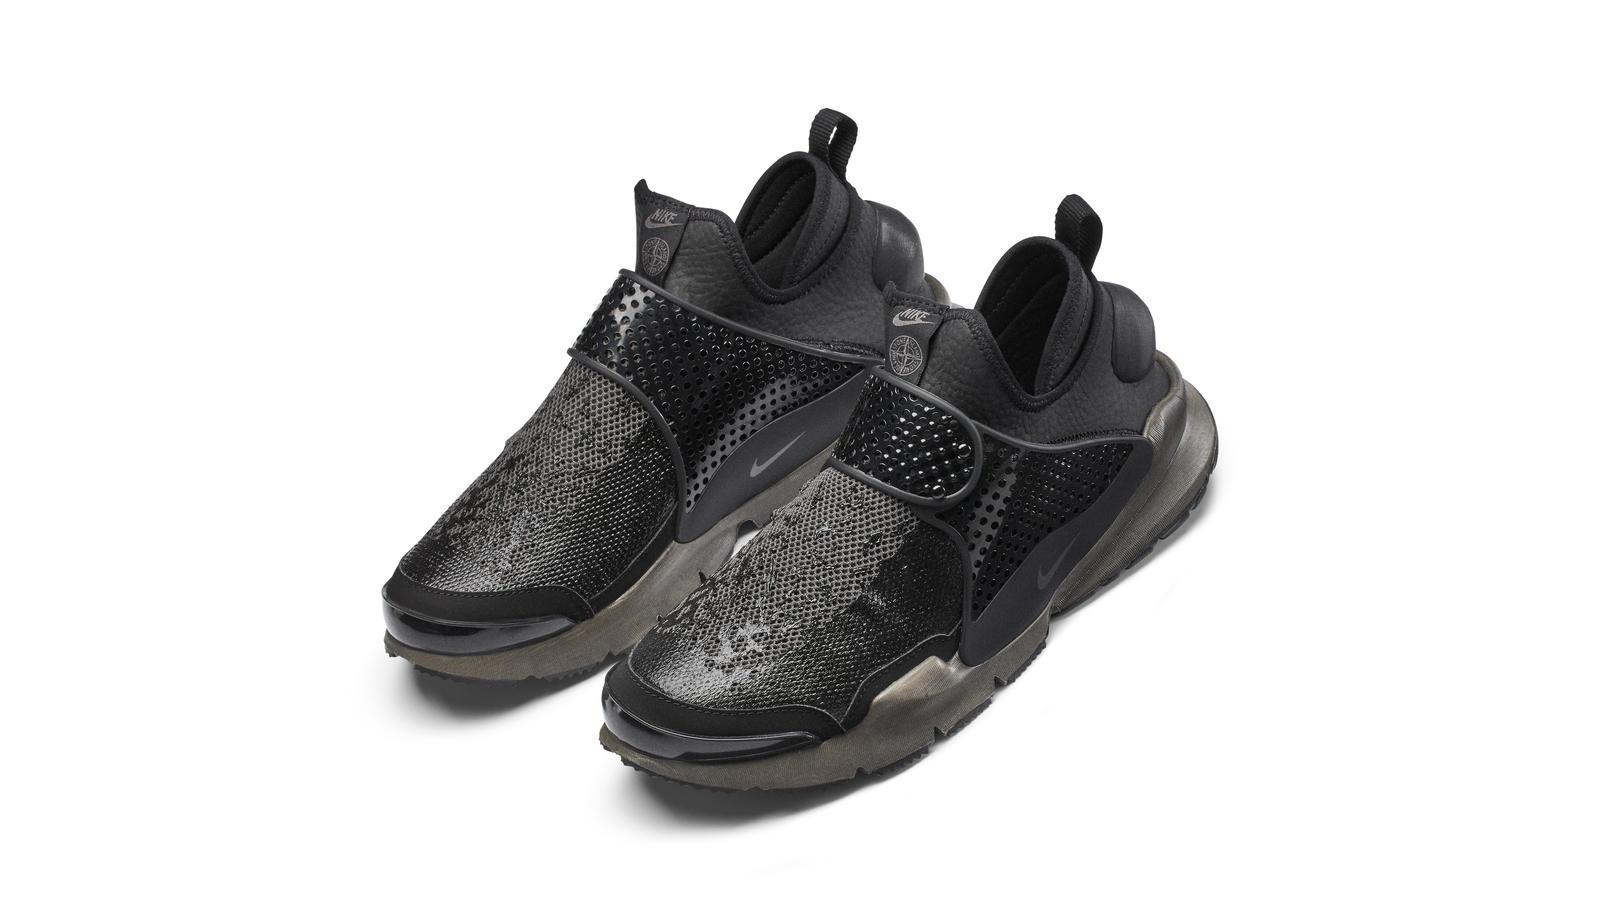 The Sock Stone Dart x Island Nike News NikeLab Mid WdBoCxre